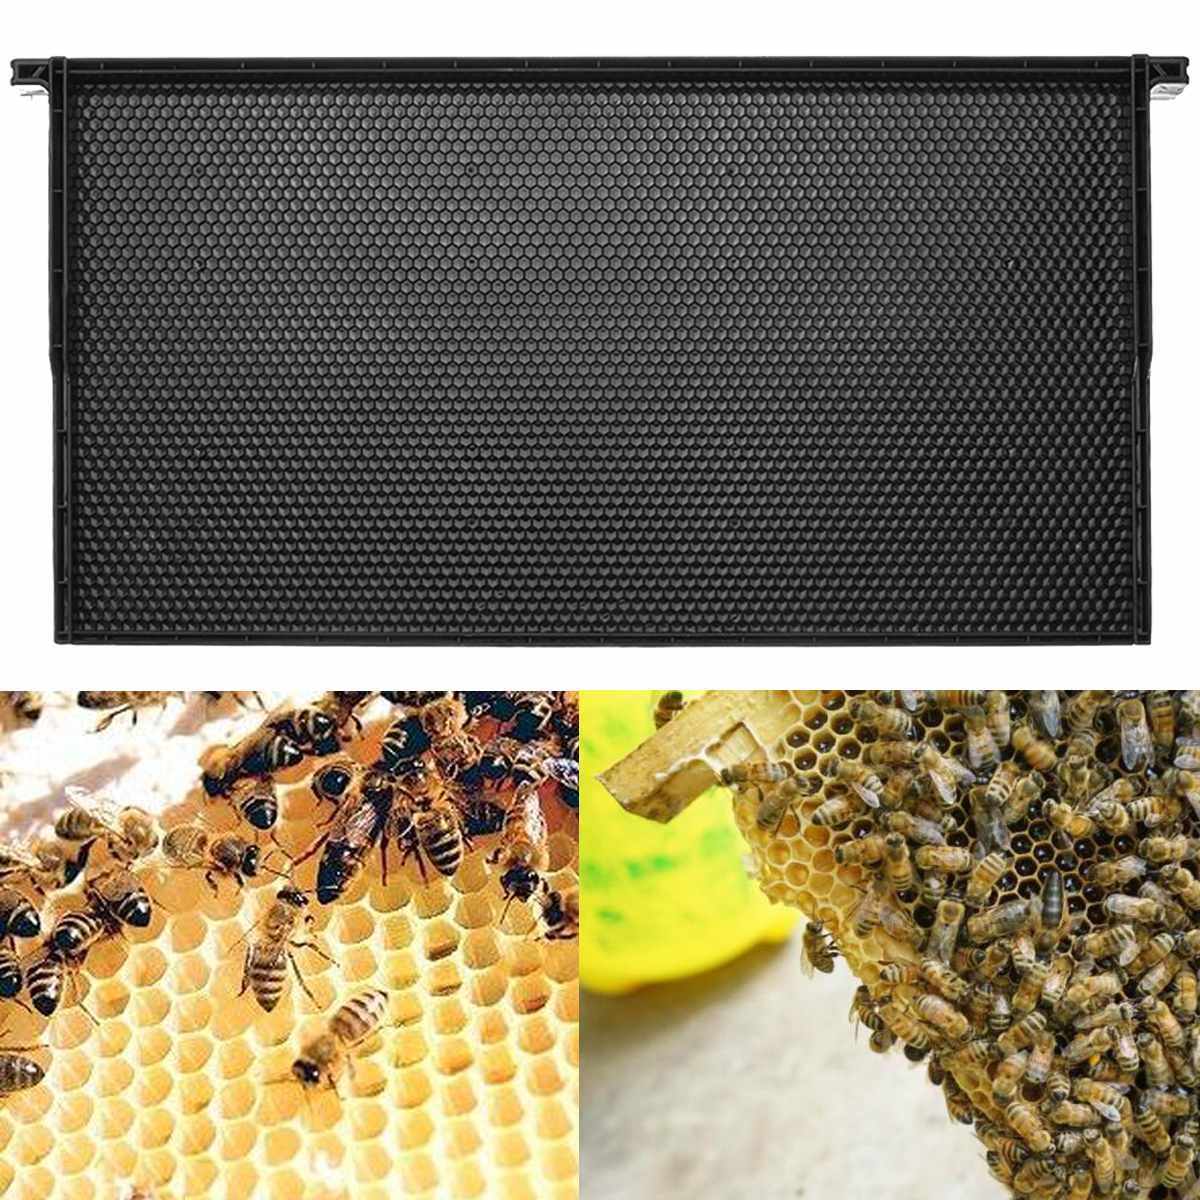 US $12 68 17% OFF|Comb Foundation Beekeeping Supplies Plastic Black Comb  Wax Foundation Comb Beehive Frames Honey Bee Beekeeping Hive Tools-in